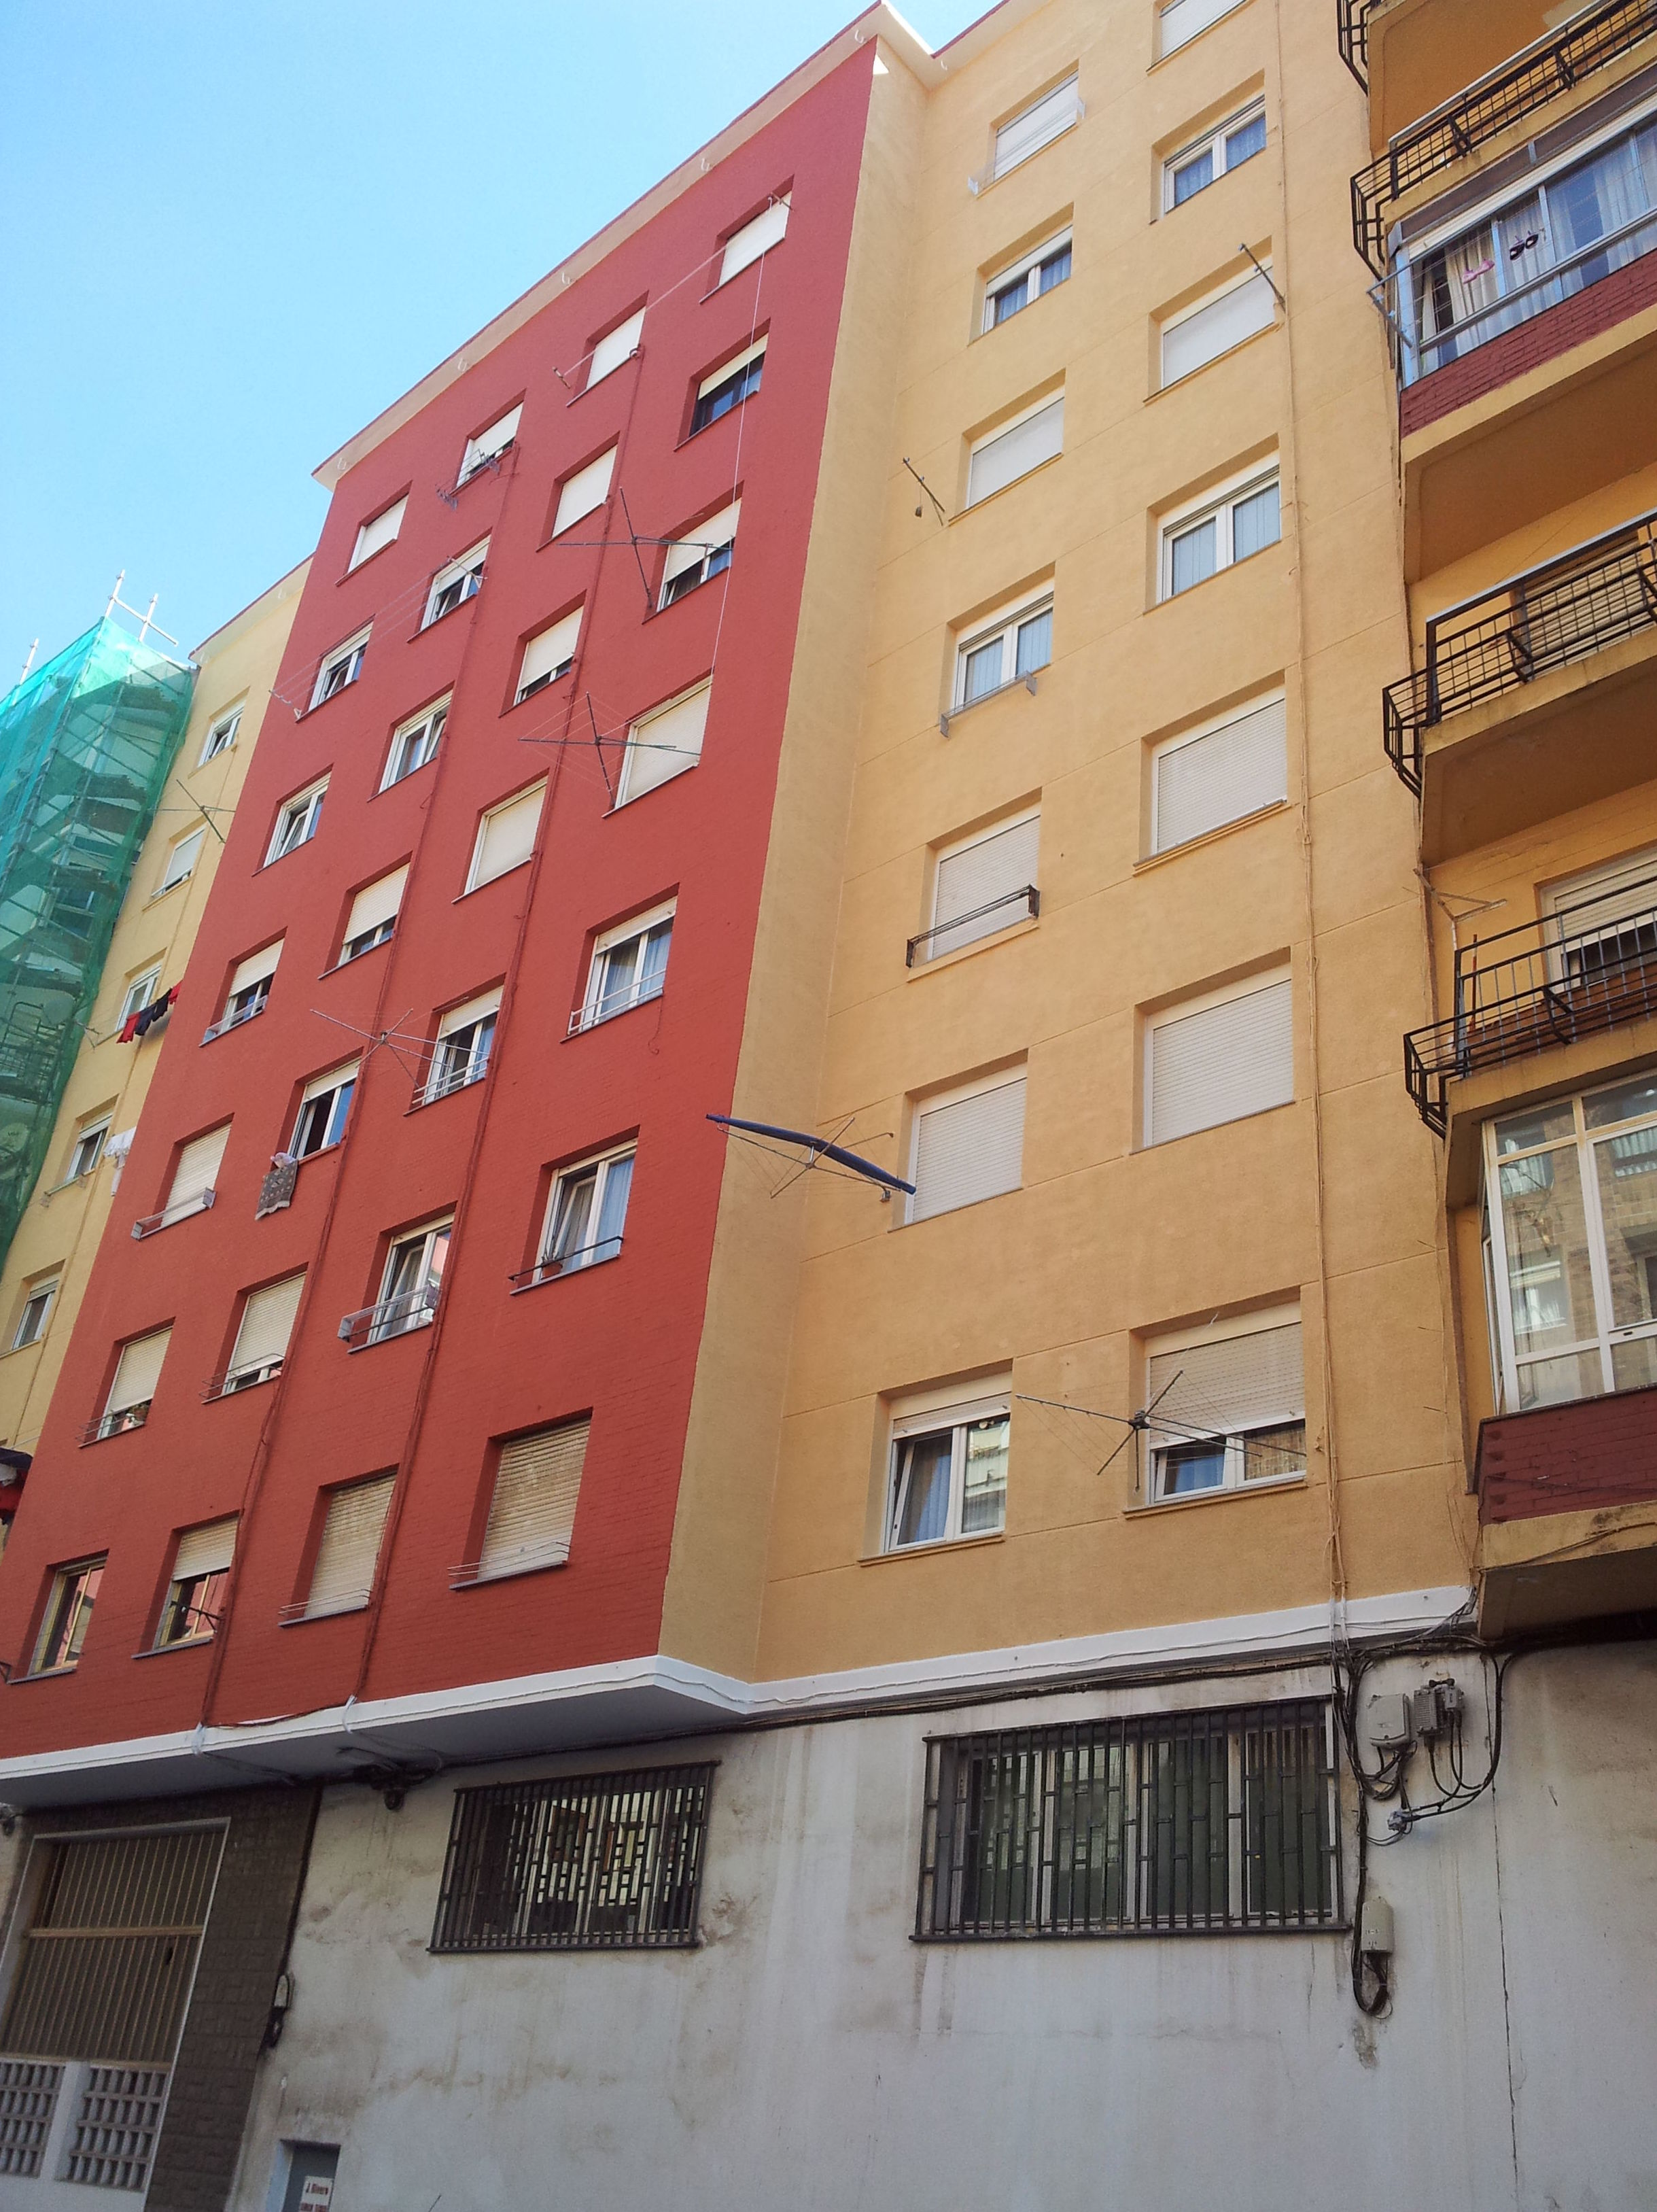 Empresa de rehabilitaci n de fachadas en santander - Empresas de fachadas ...